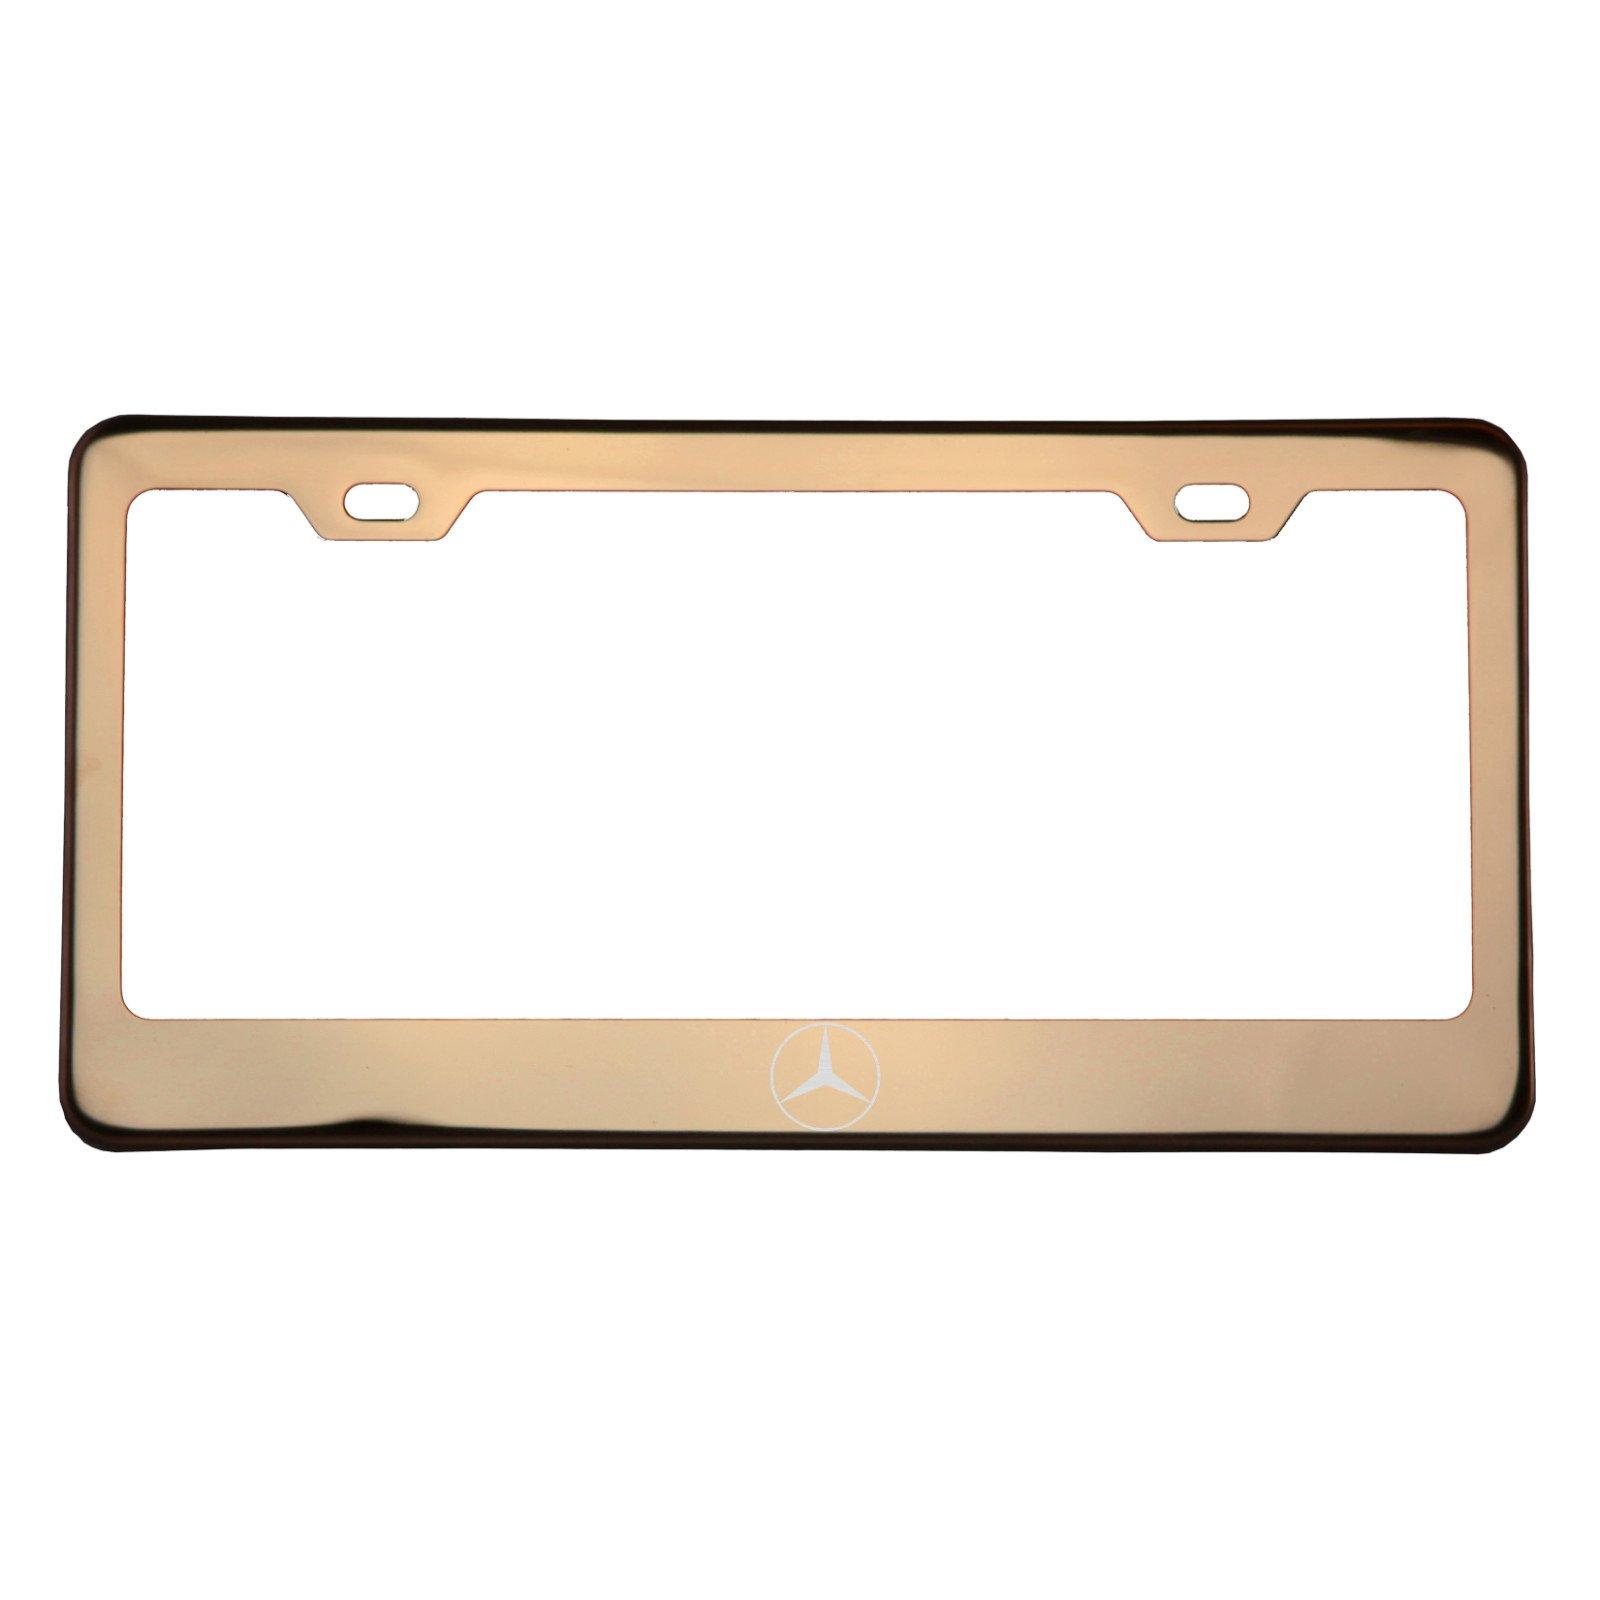 Amazoncom mercedes license plate